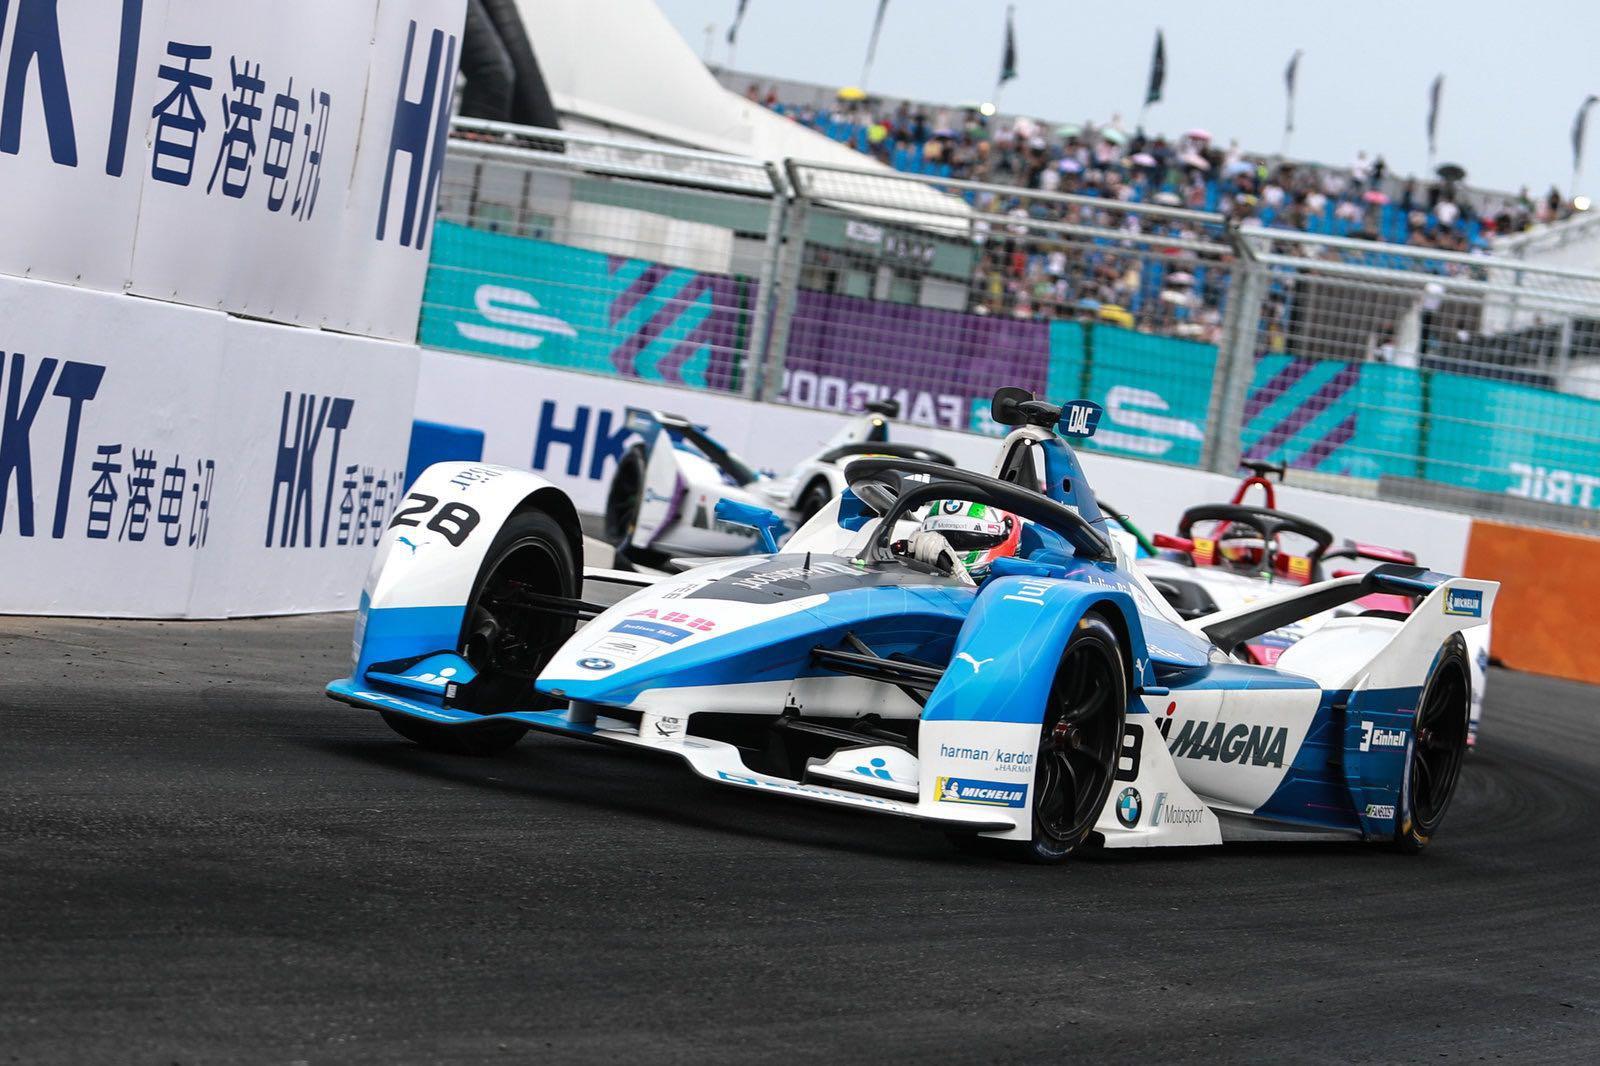 Formula E三亚站落幕 宝马车手达·科斯塔领跑车手积分榜